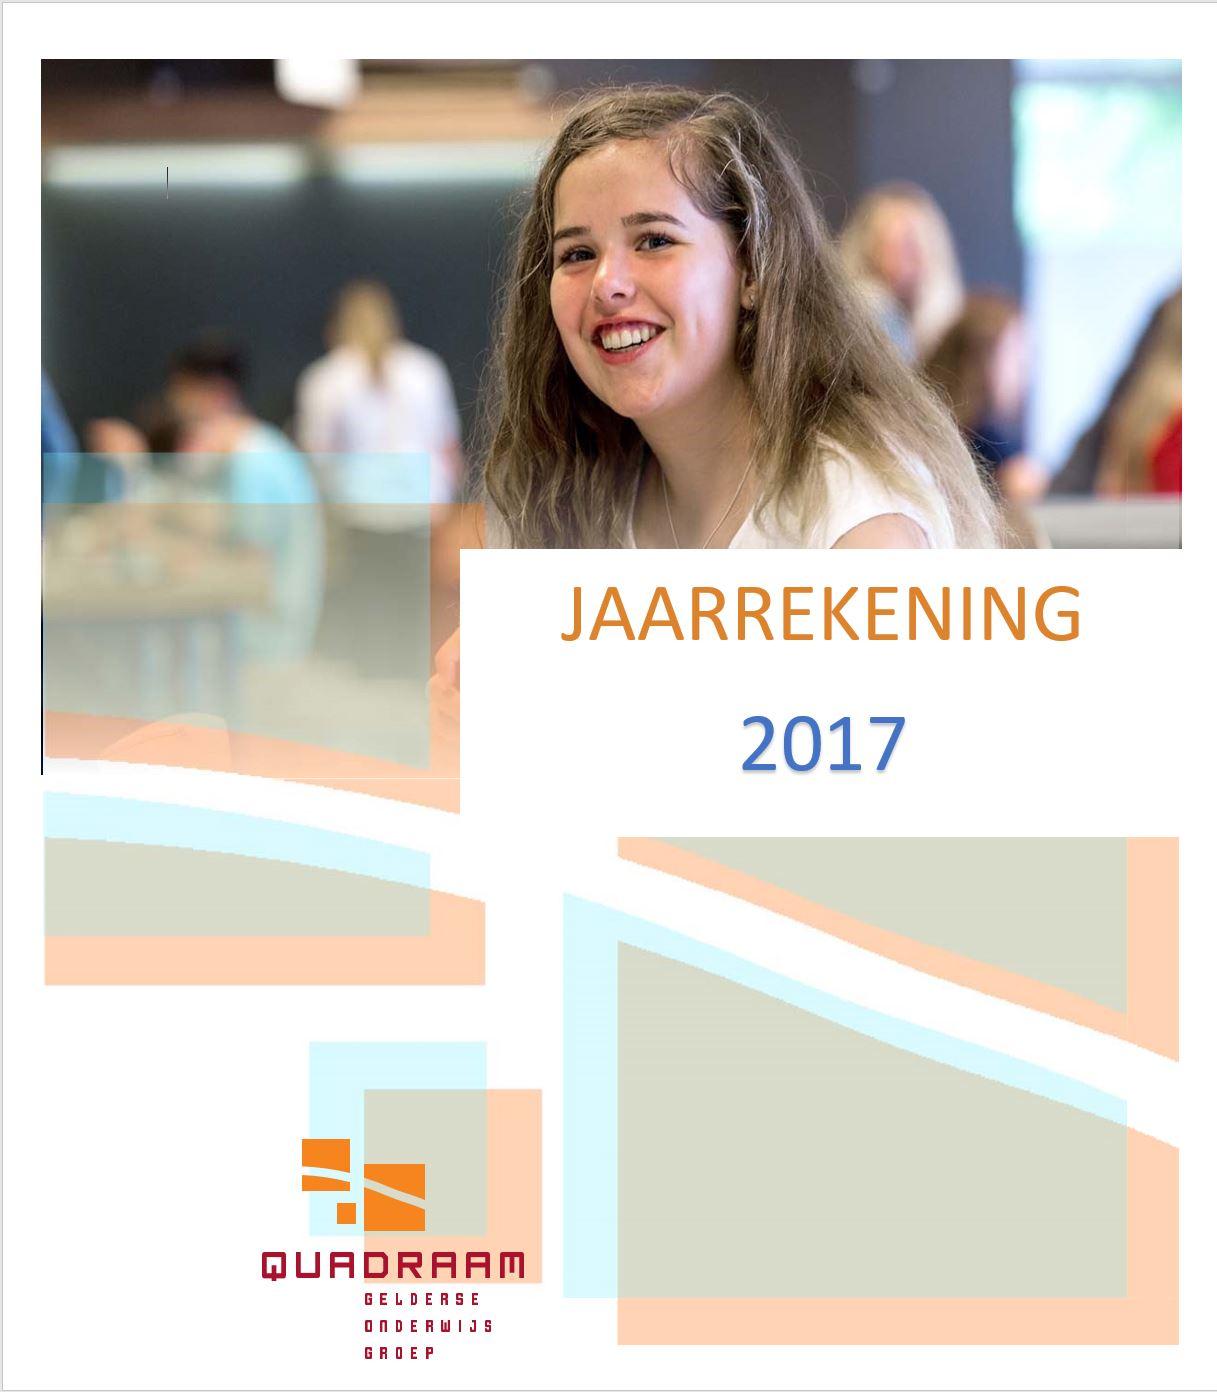 Jaarrekening 2017